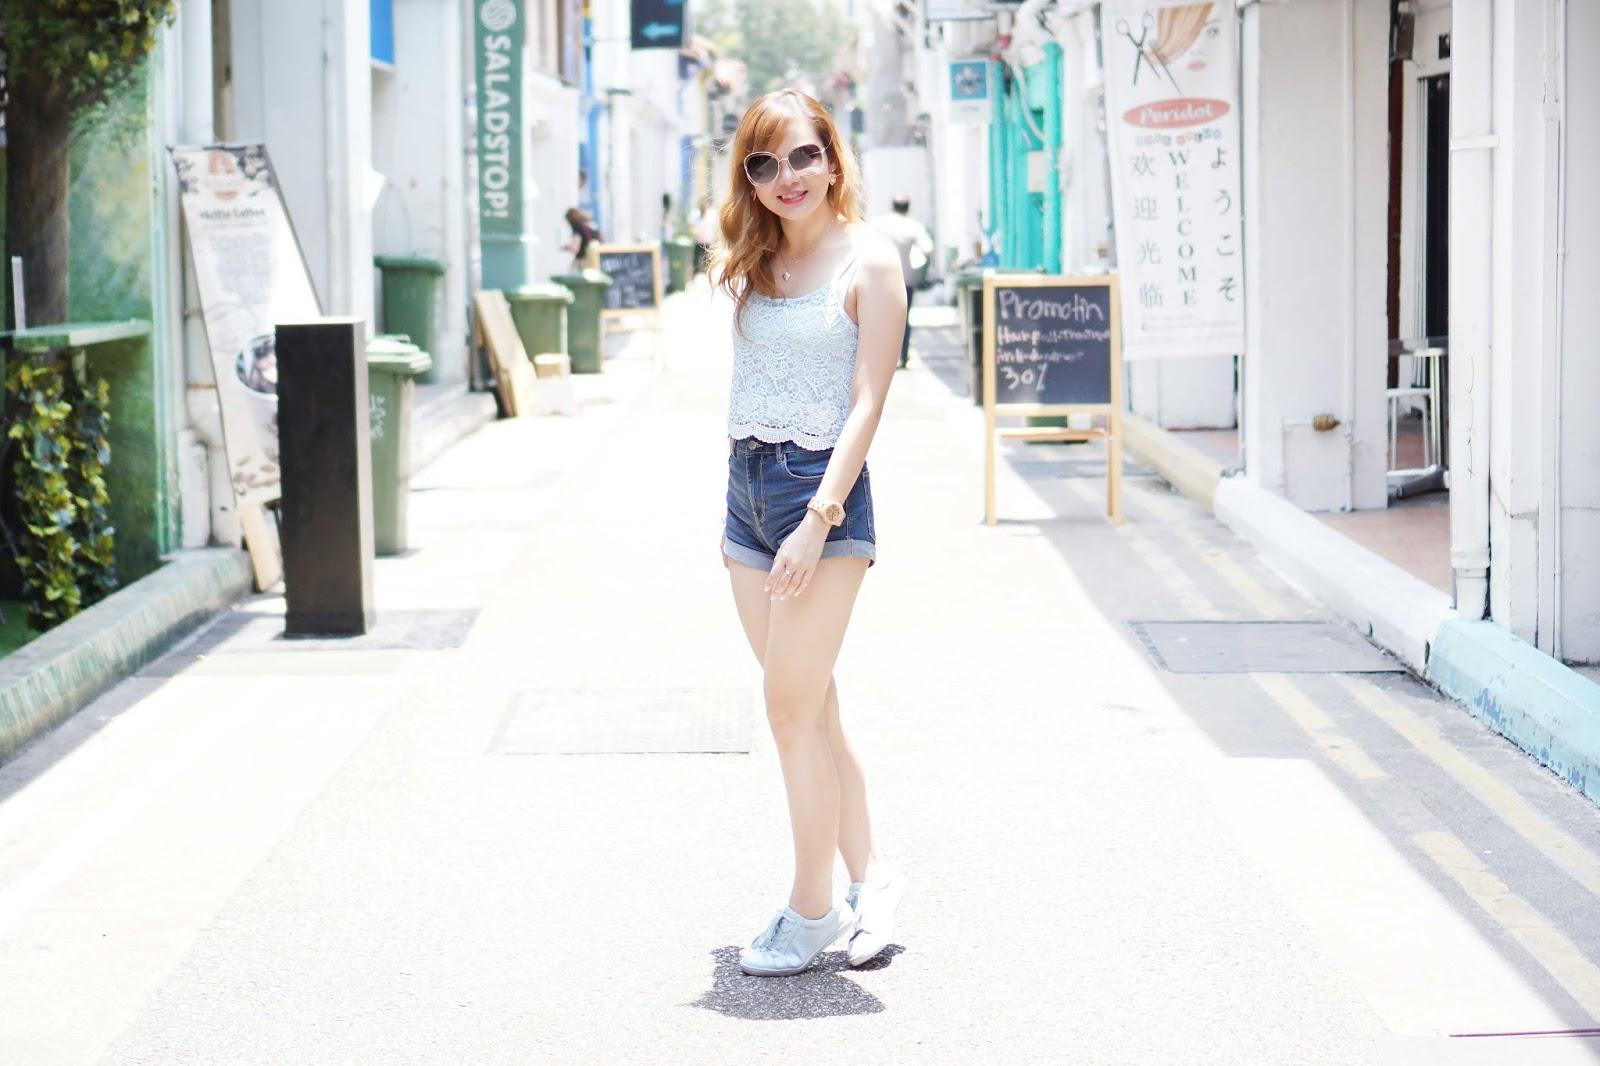 Ootd Casual Summer At Haji Lane Singapore Travel With Jean Milka Jean Milka